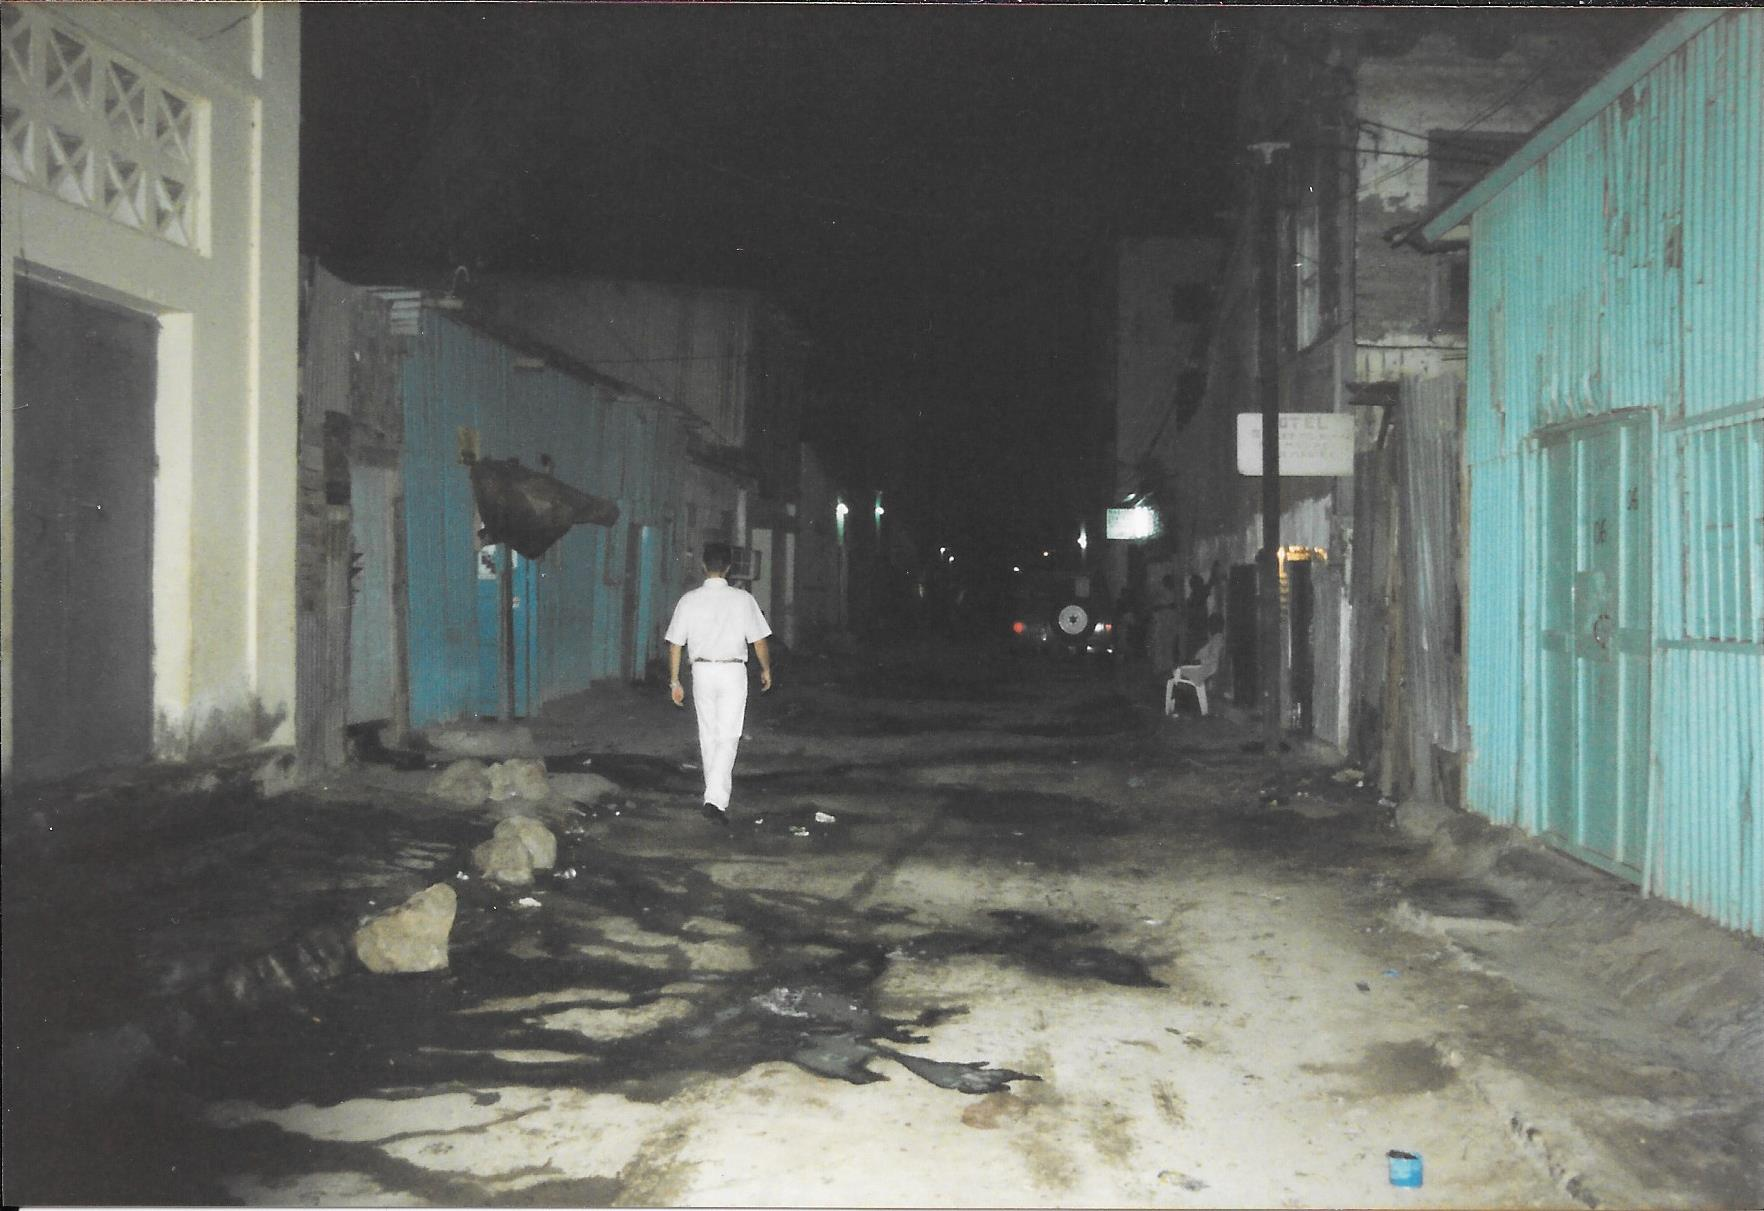 [Campagne] DJIBOUTI - TOME 1 - Page 21 213